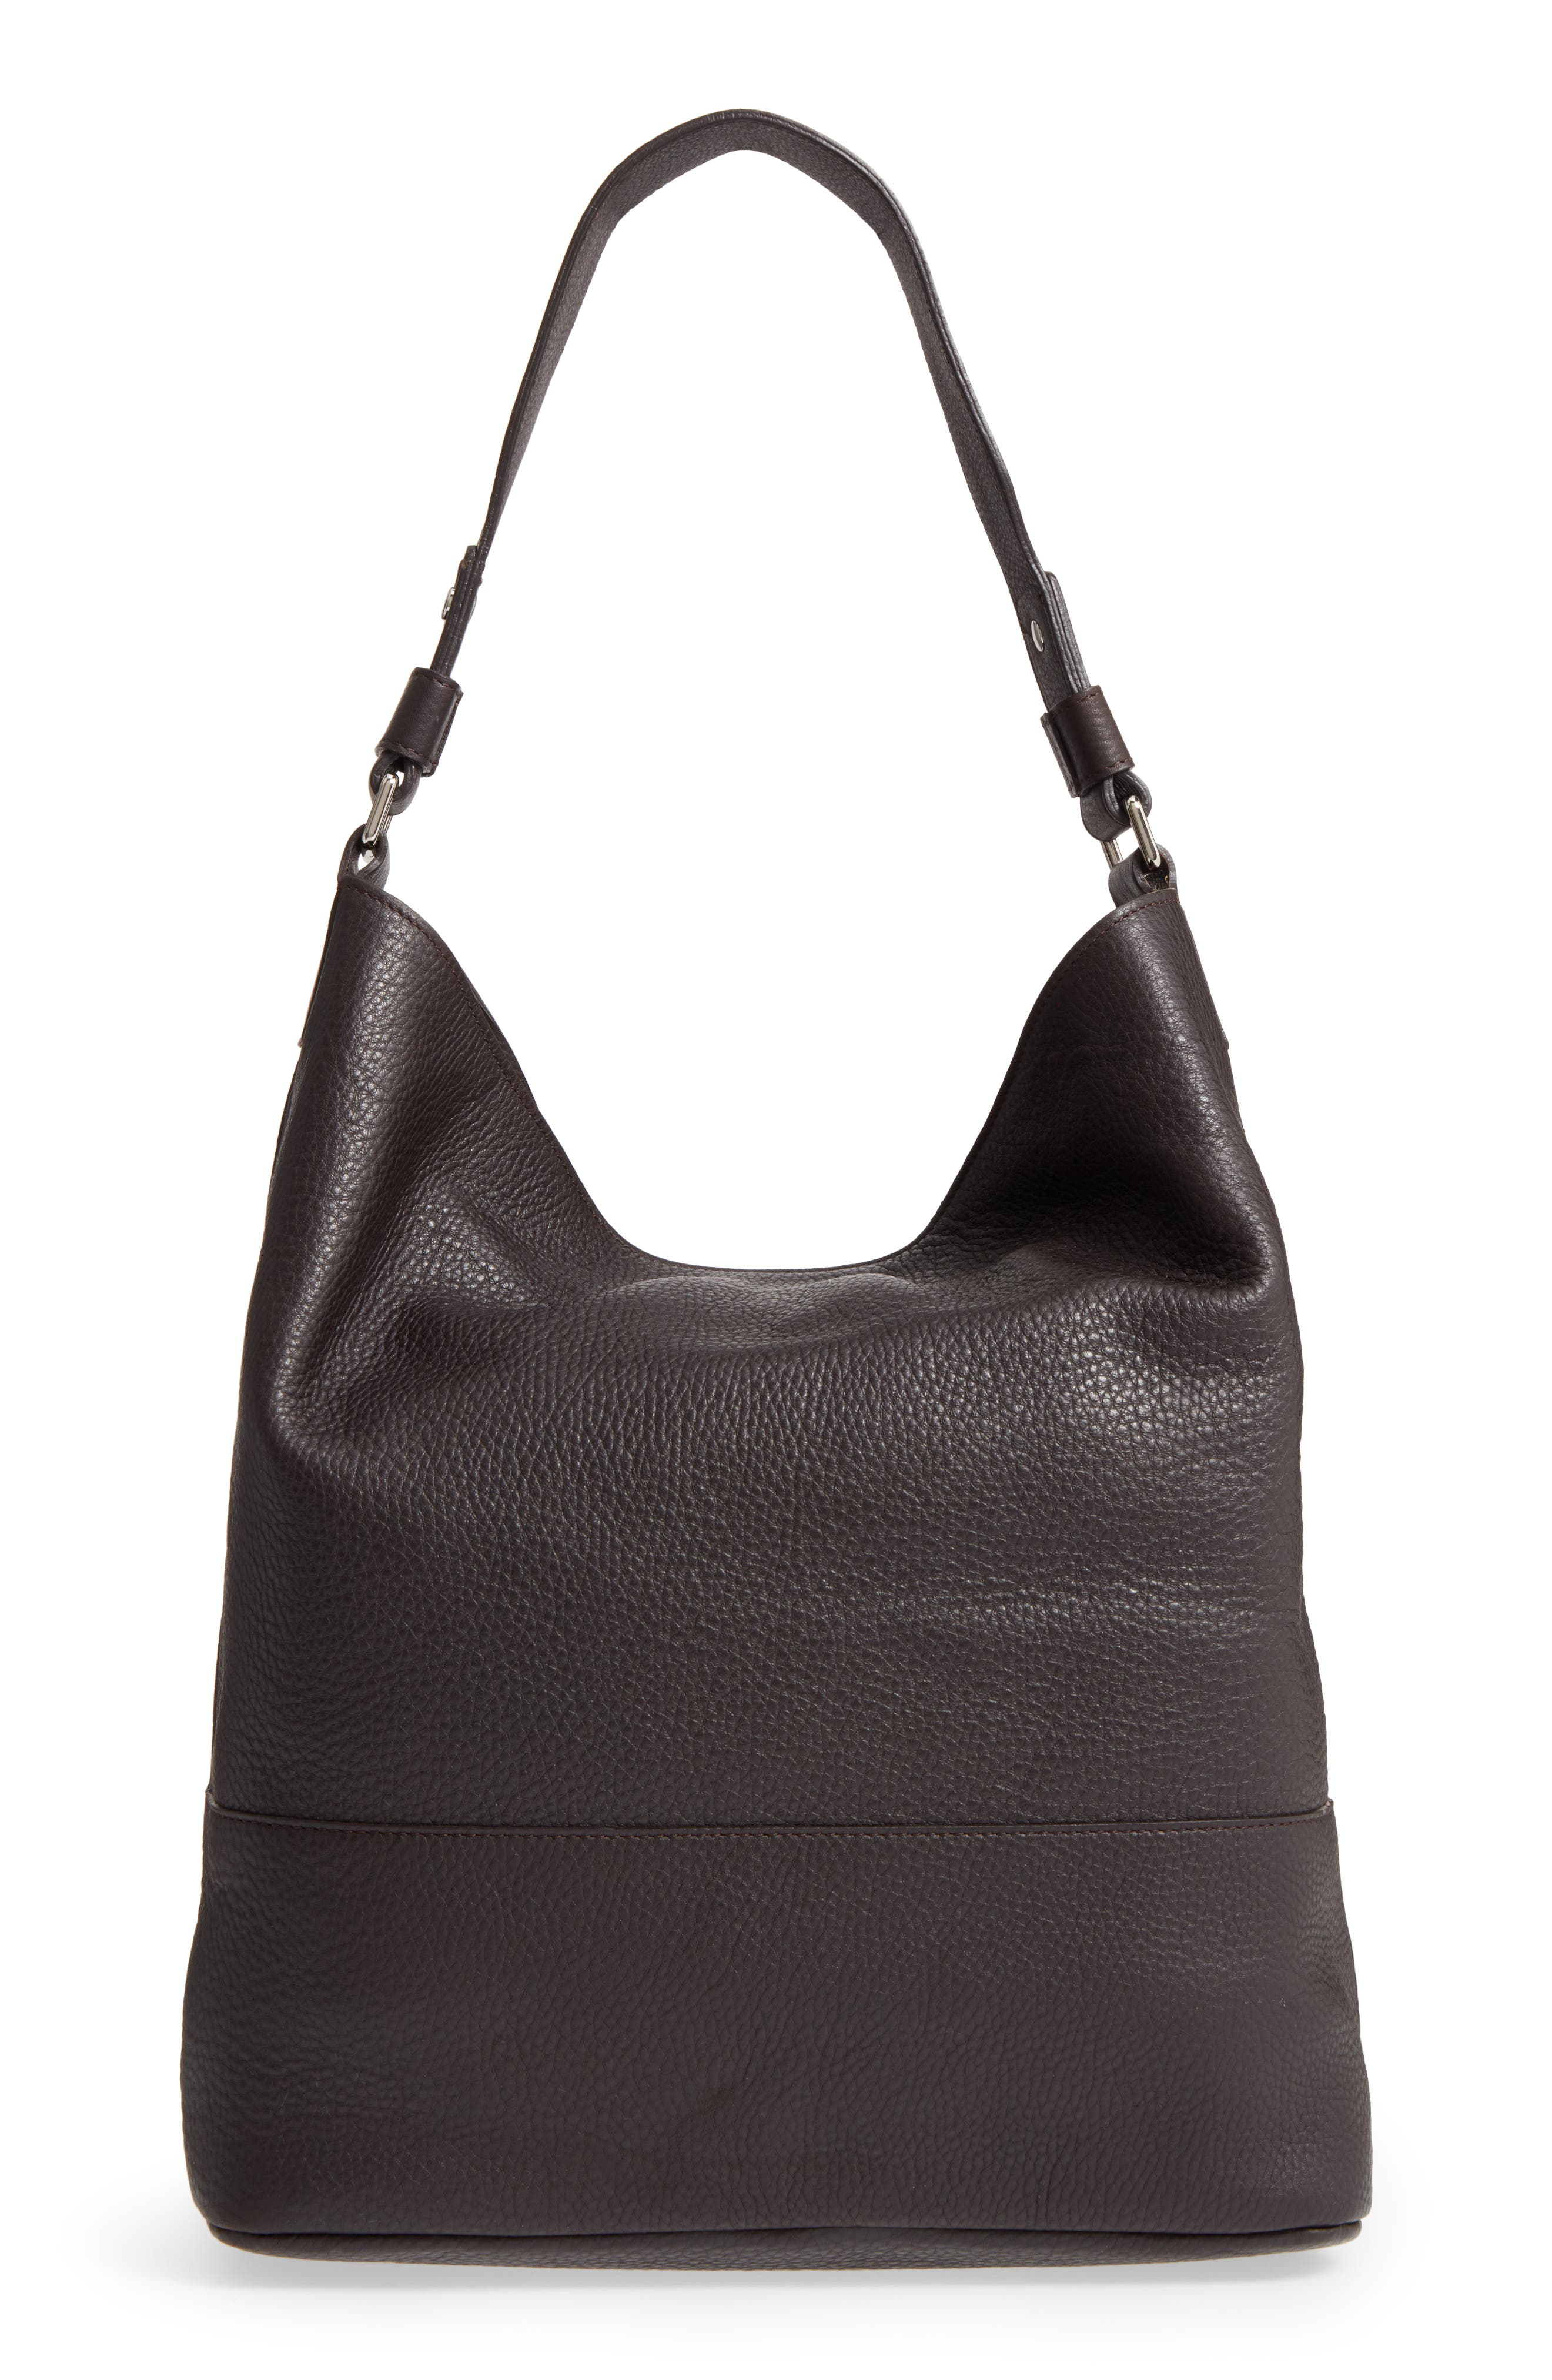 Relaxed Calfskin Leather Hobo Bag,                             Alternate thumbnail 3, color,                             240